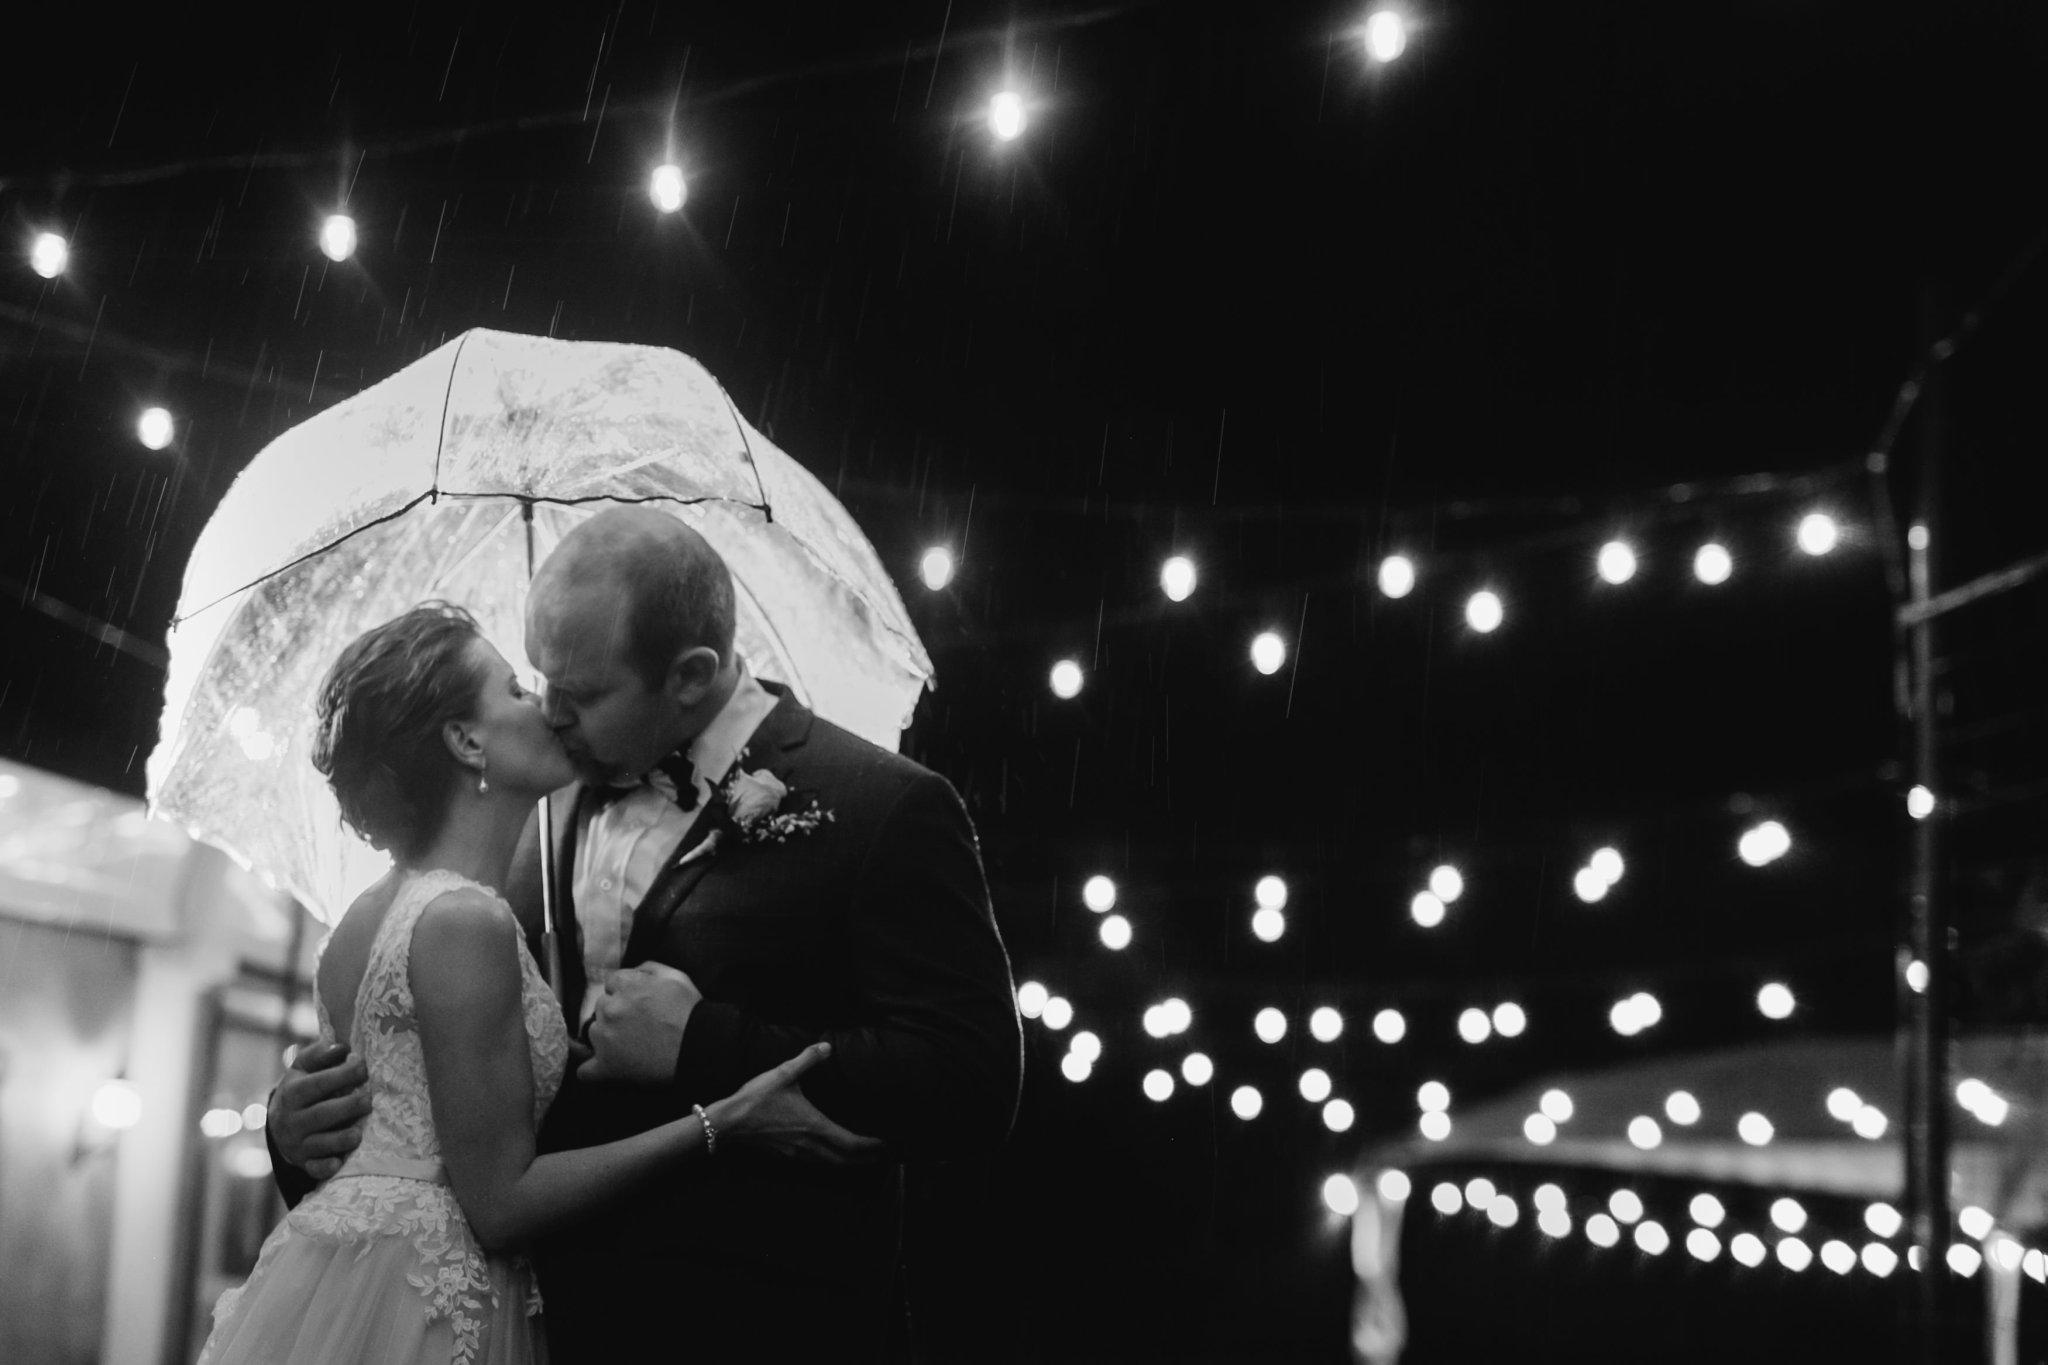 bride & groom under umbrella while raining at night by Phoenix wedding photographer